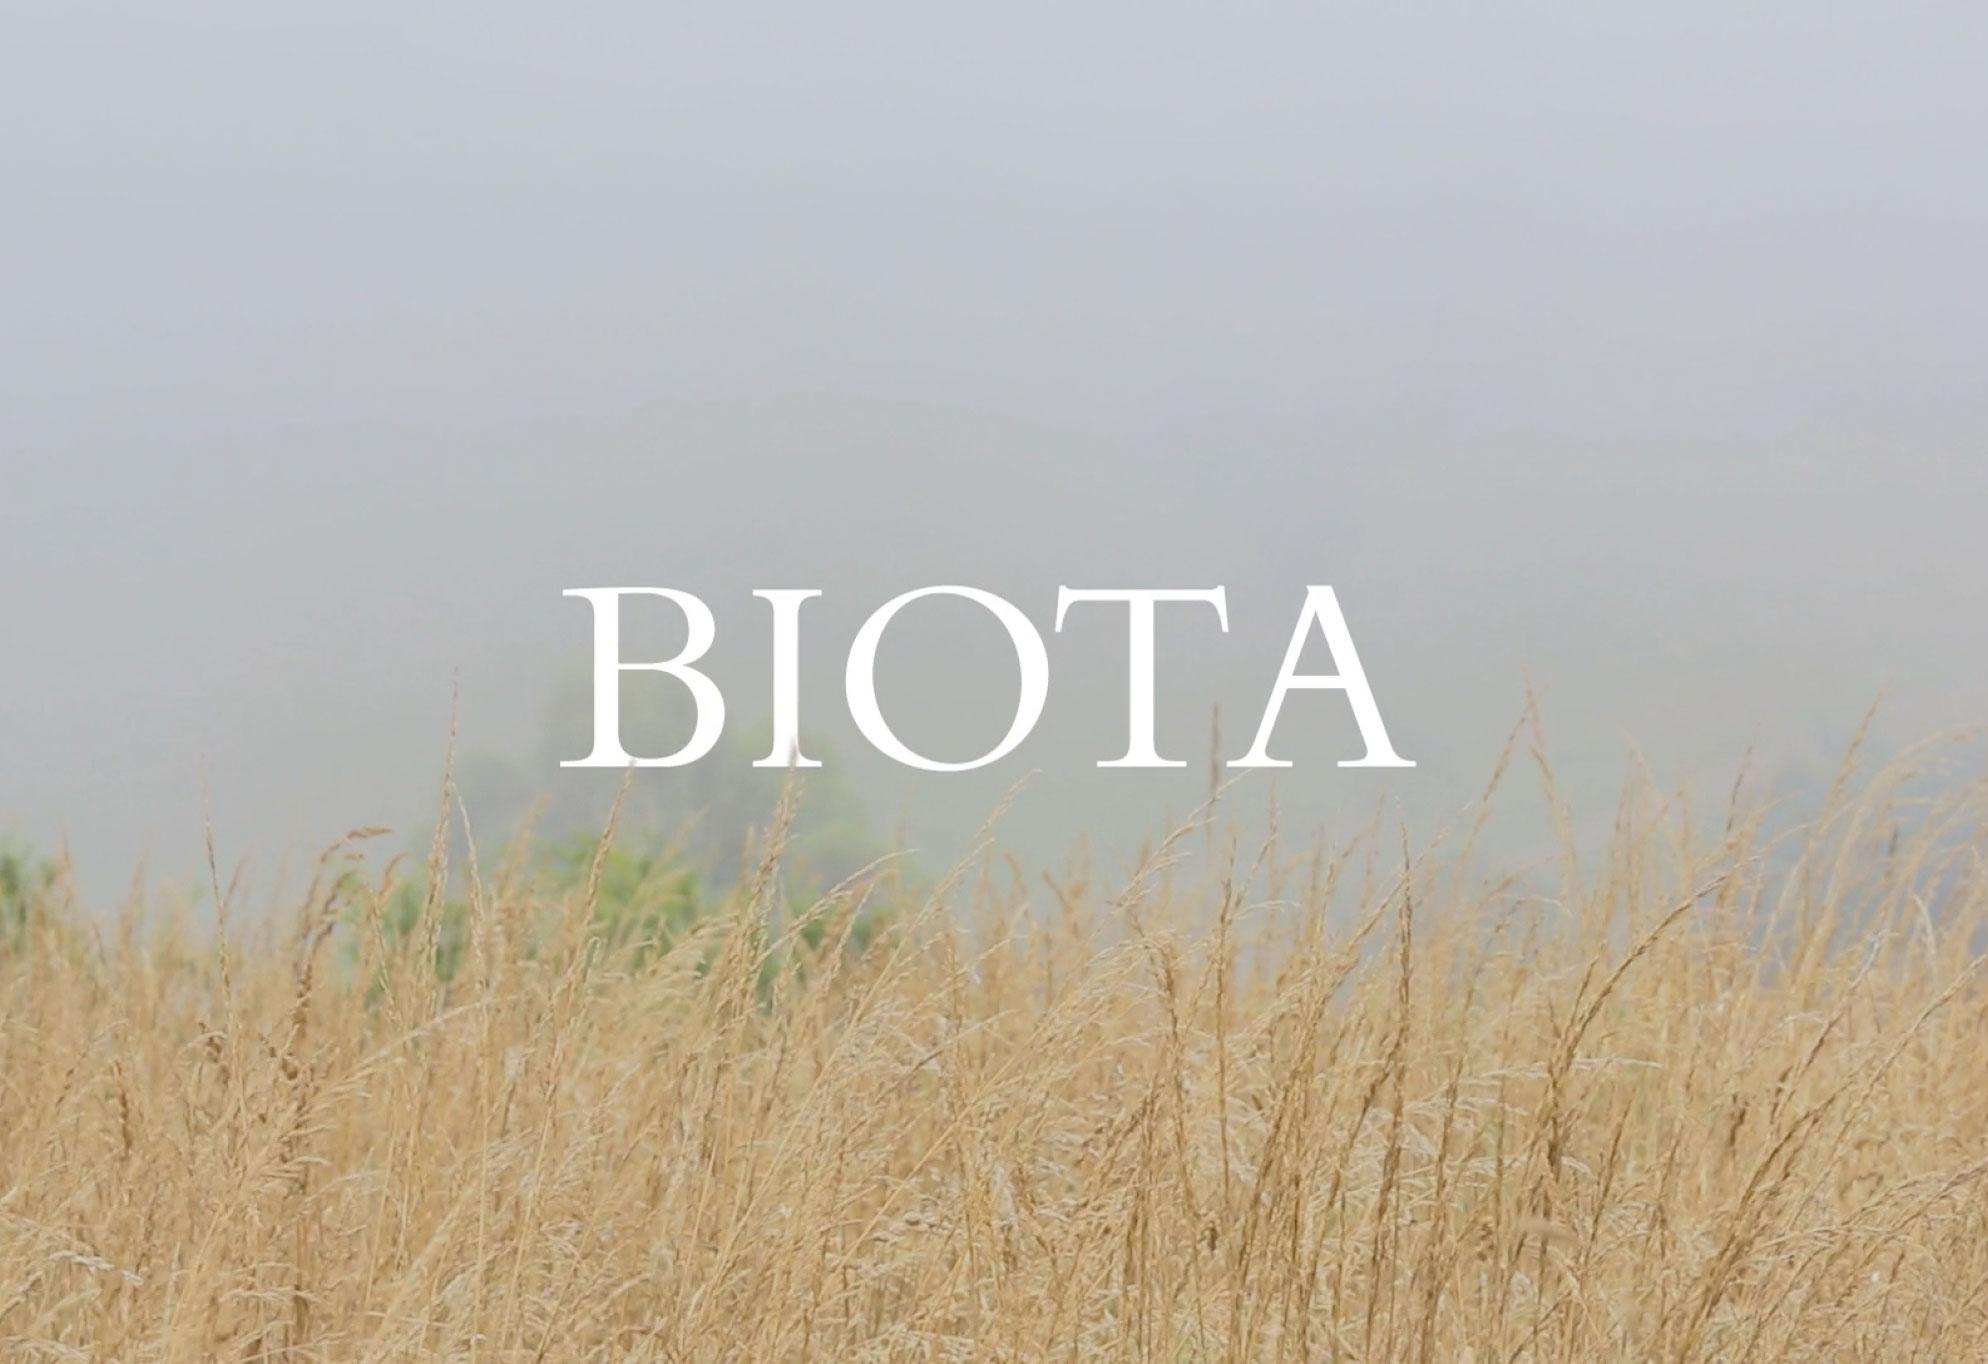 BIOTA RESTAURANT FILM